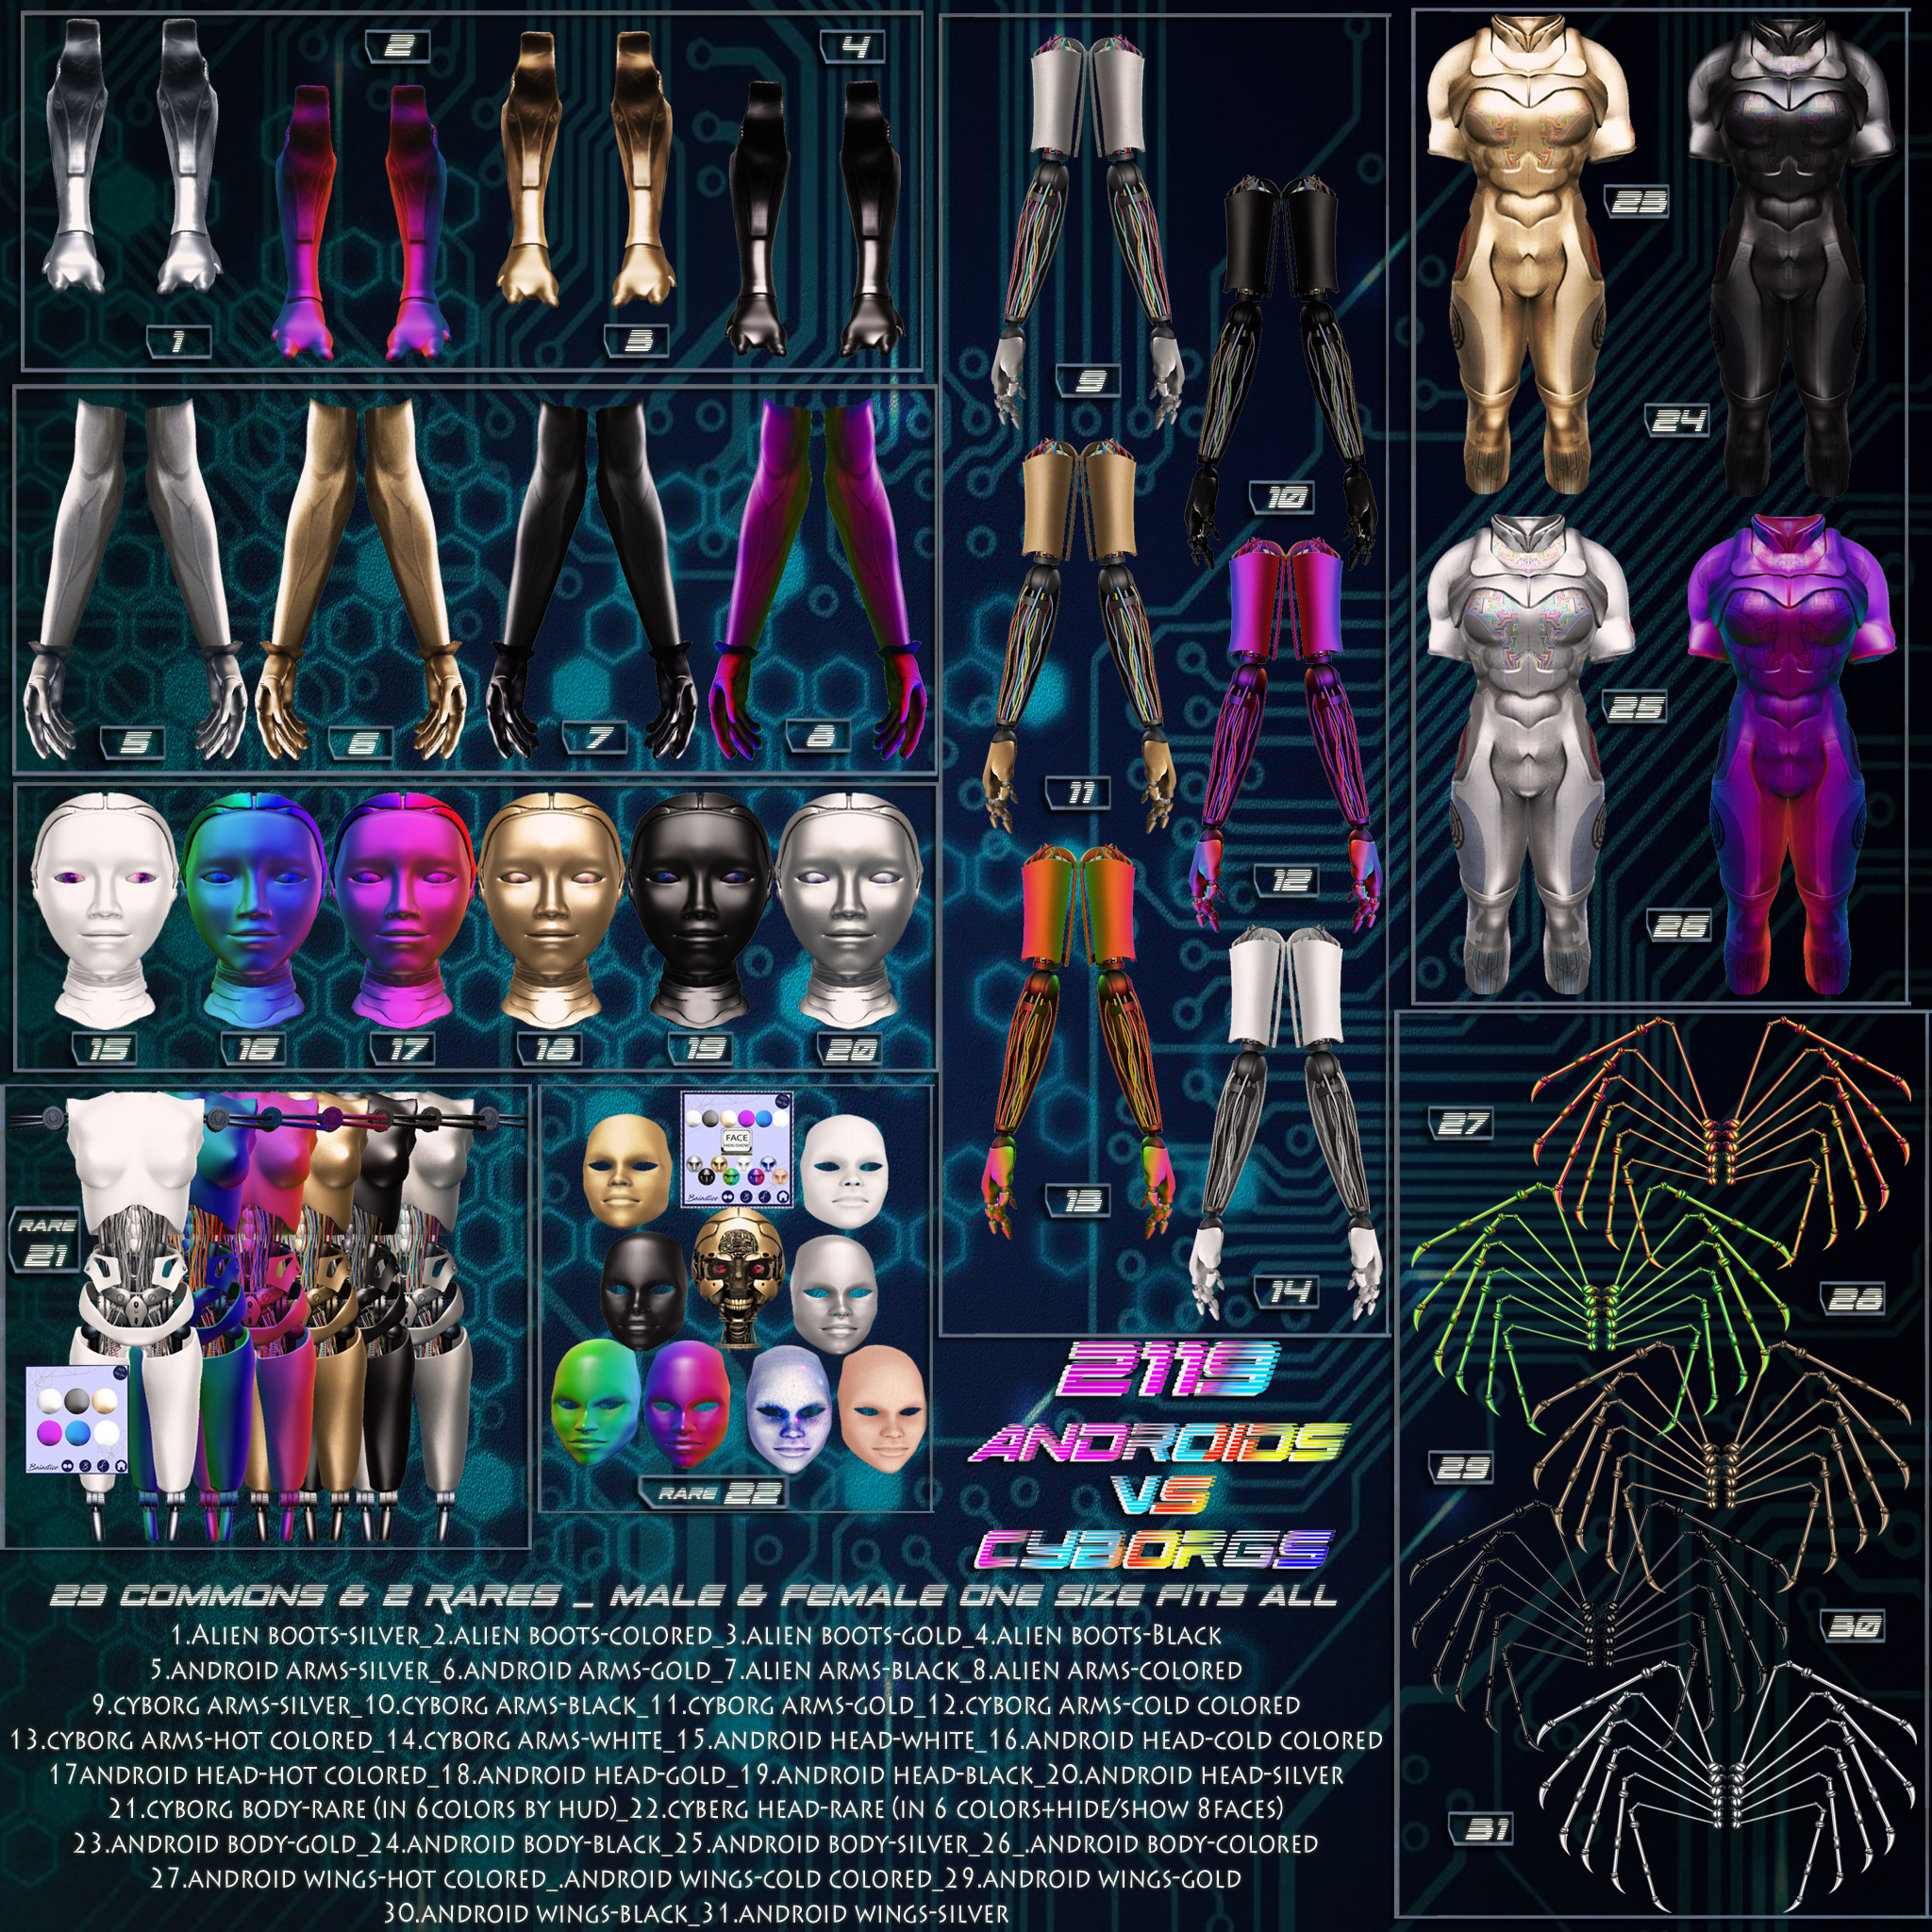 Baiastice_2119 Androids VS Cyborgs key A - Copy.jpg